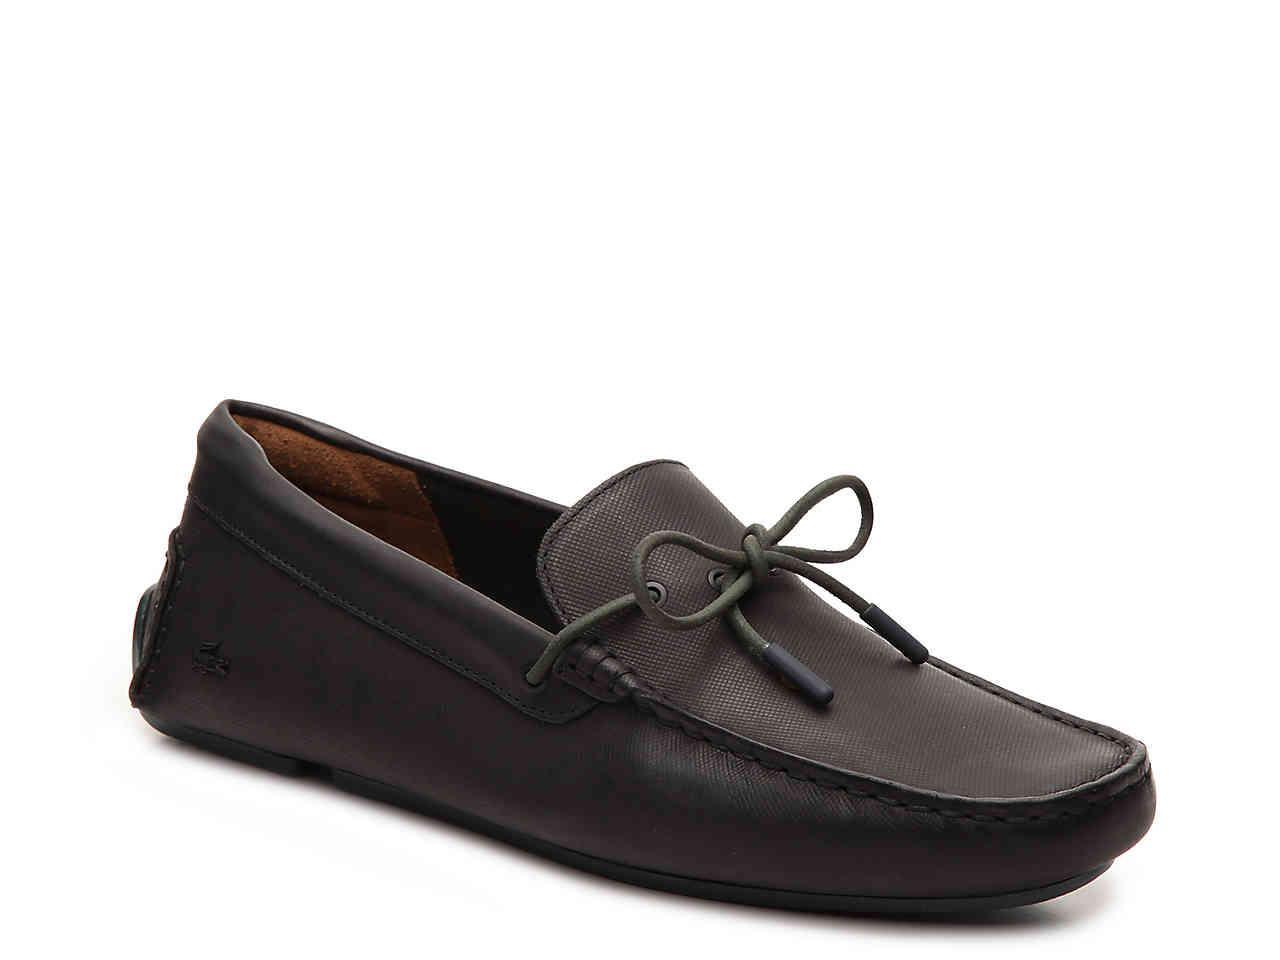 d9497dda22b6e9 Men s Black Piloter Loafer best quality e422a e4501  Lyst - Lacoste Concours  18 Driving Moc ...